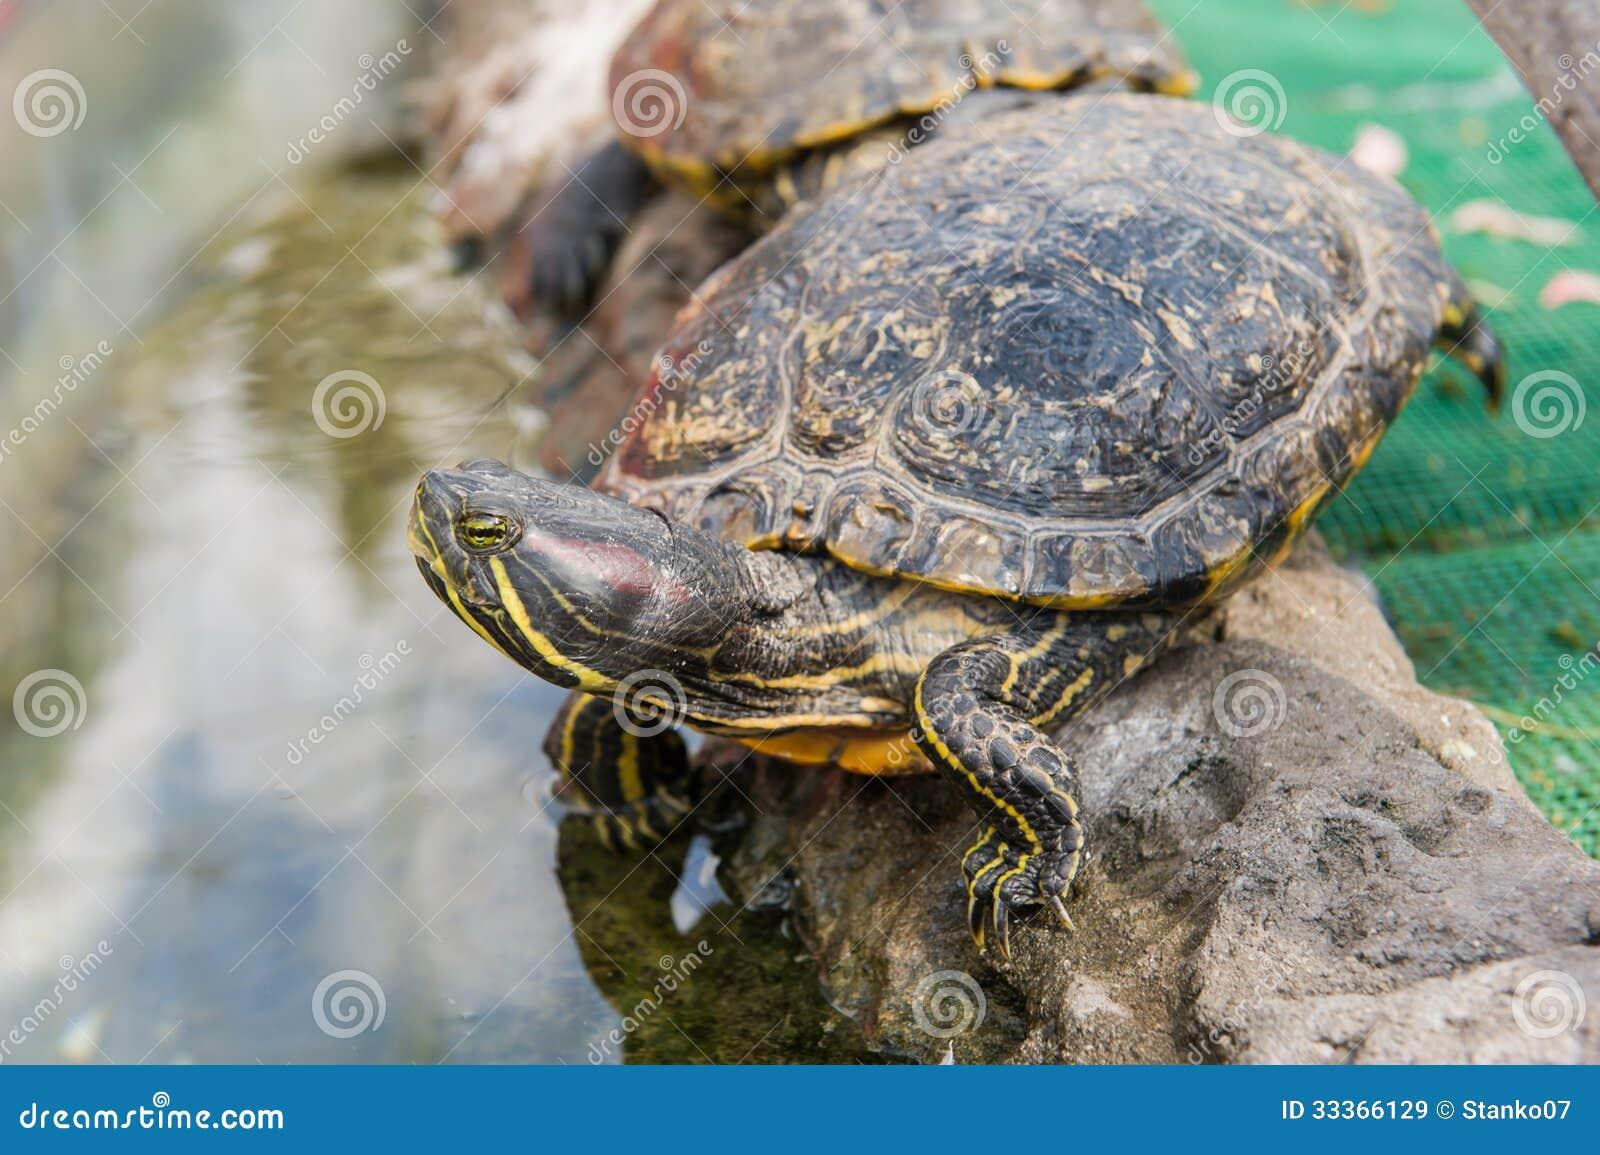 O G Turtle Documentary Aquatic Turtle Royalty...